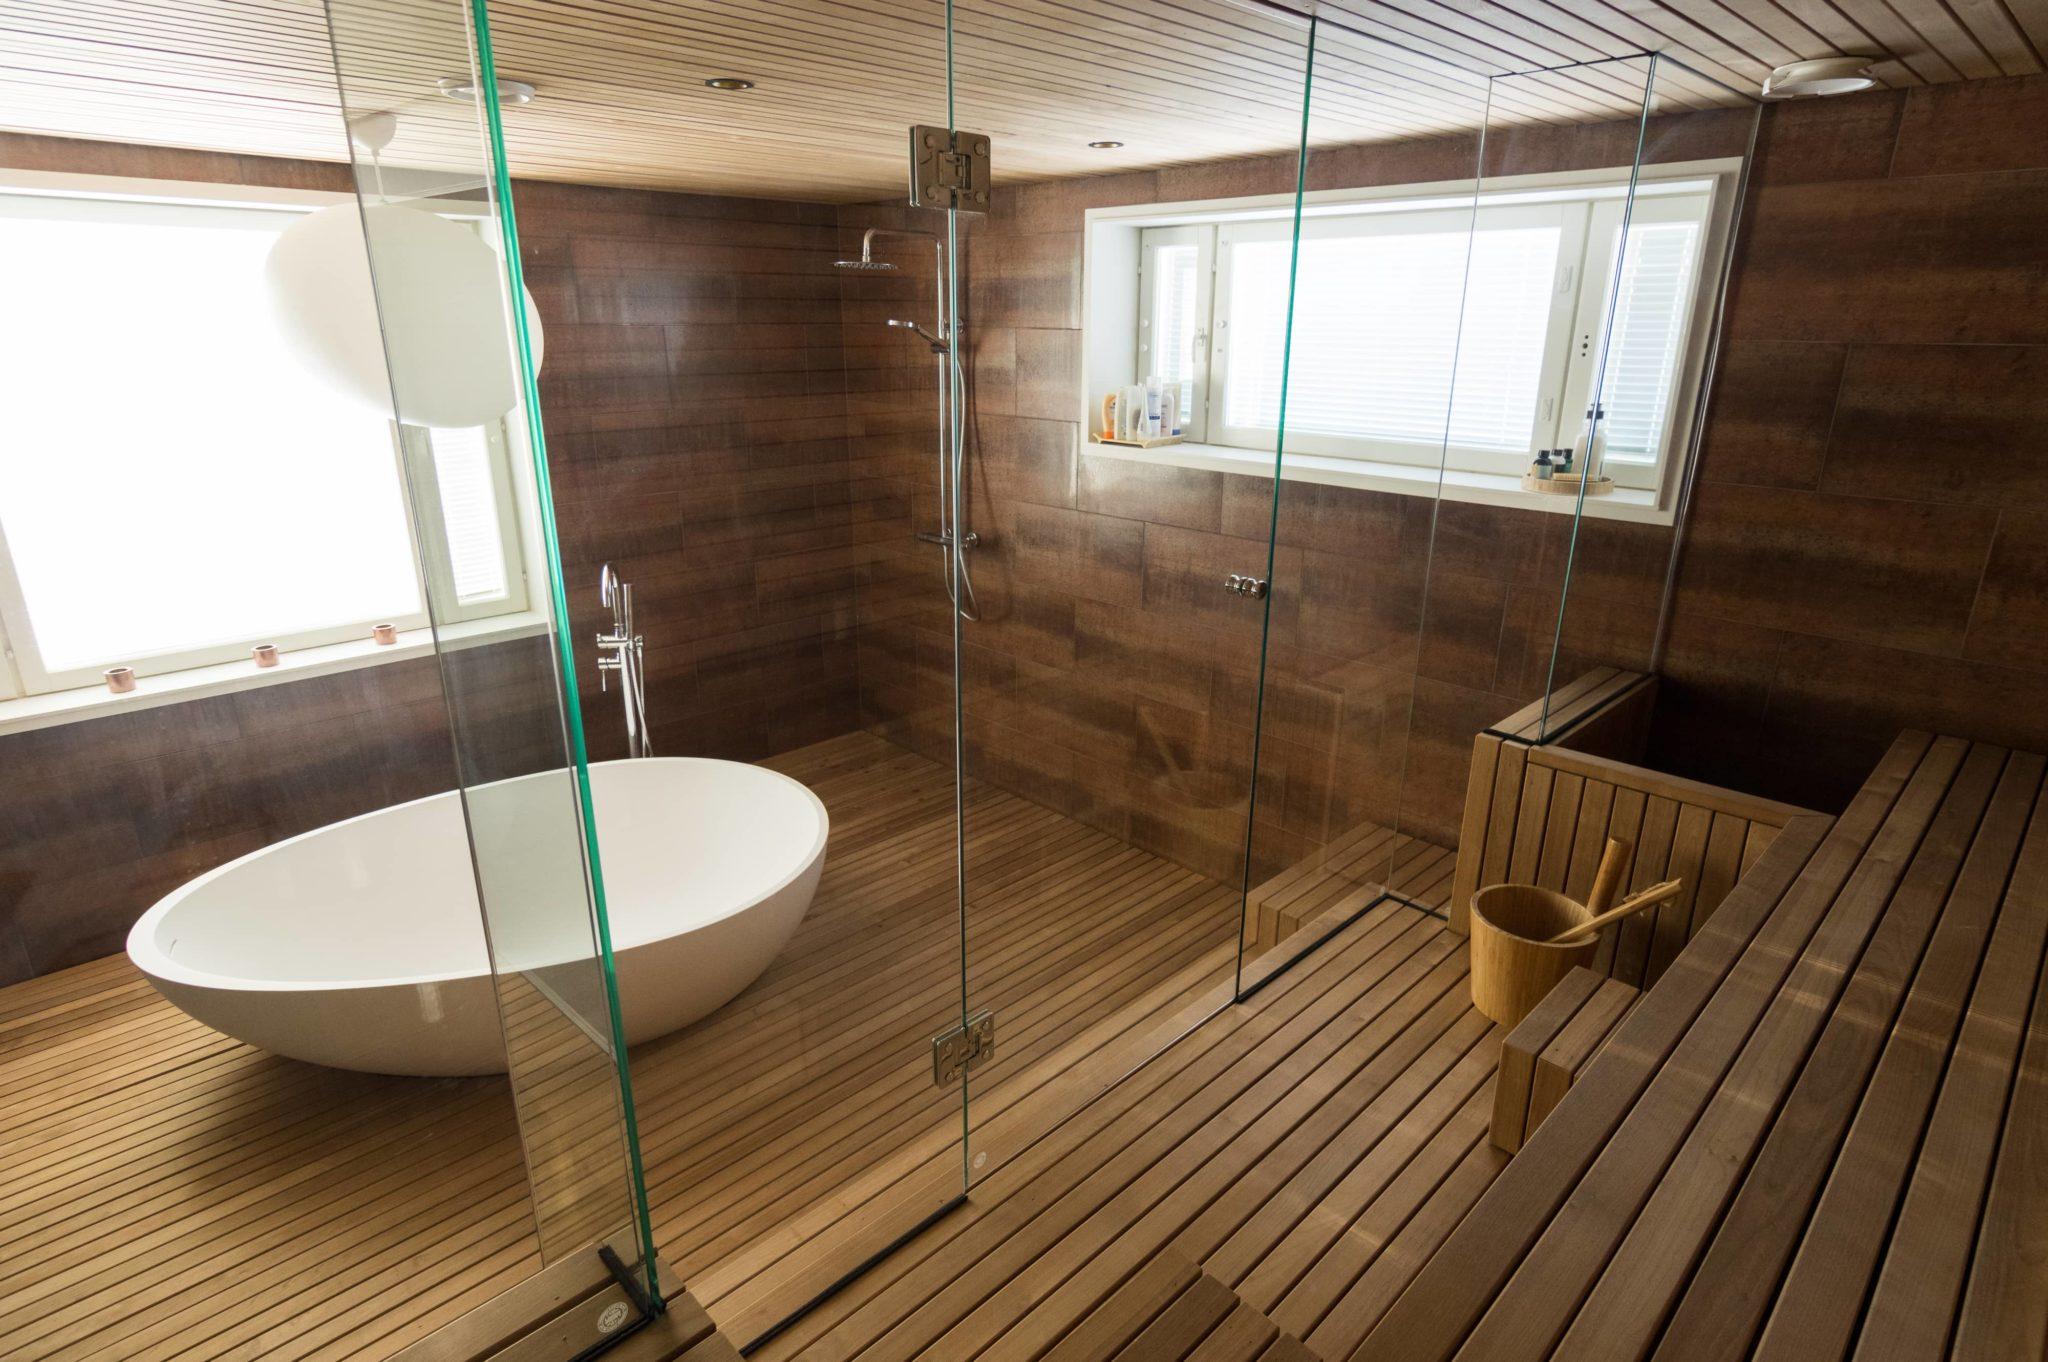 Arredo bagno,mobili bagno,mobili bagno sospesi e a terra - Tommila 5194 1